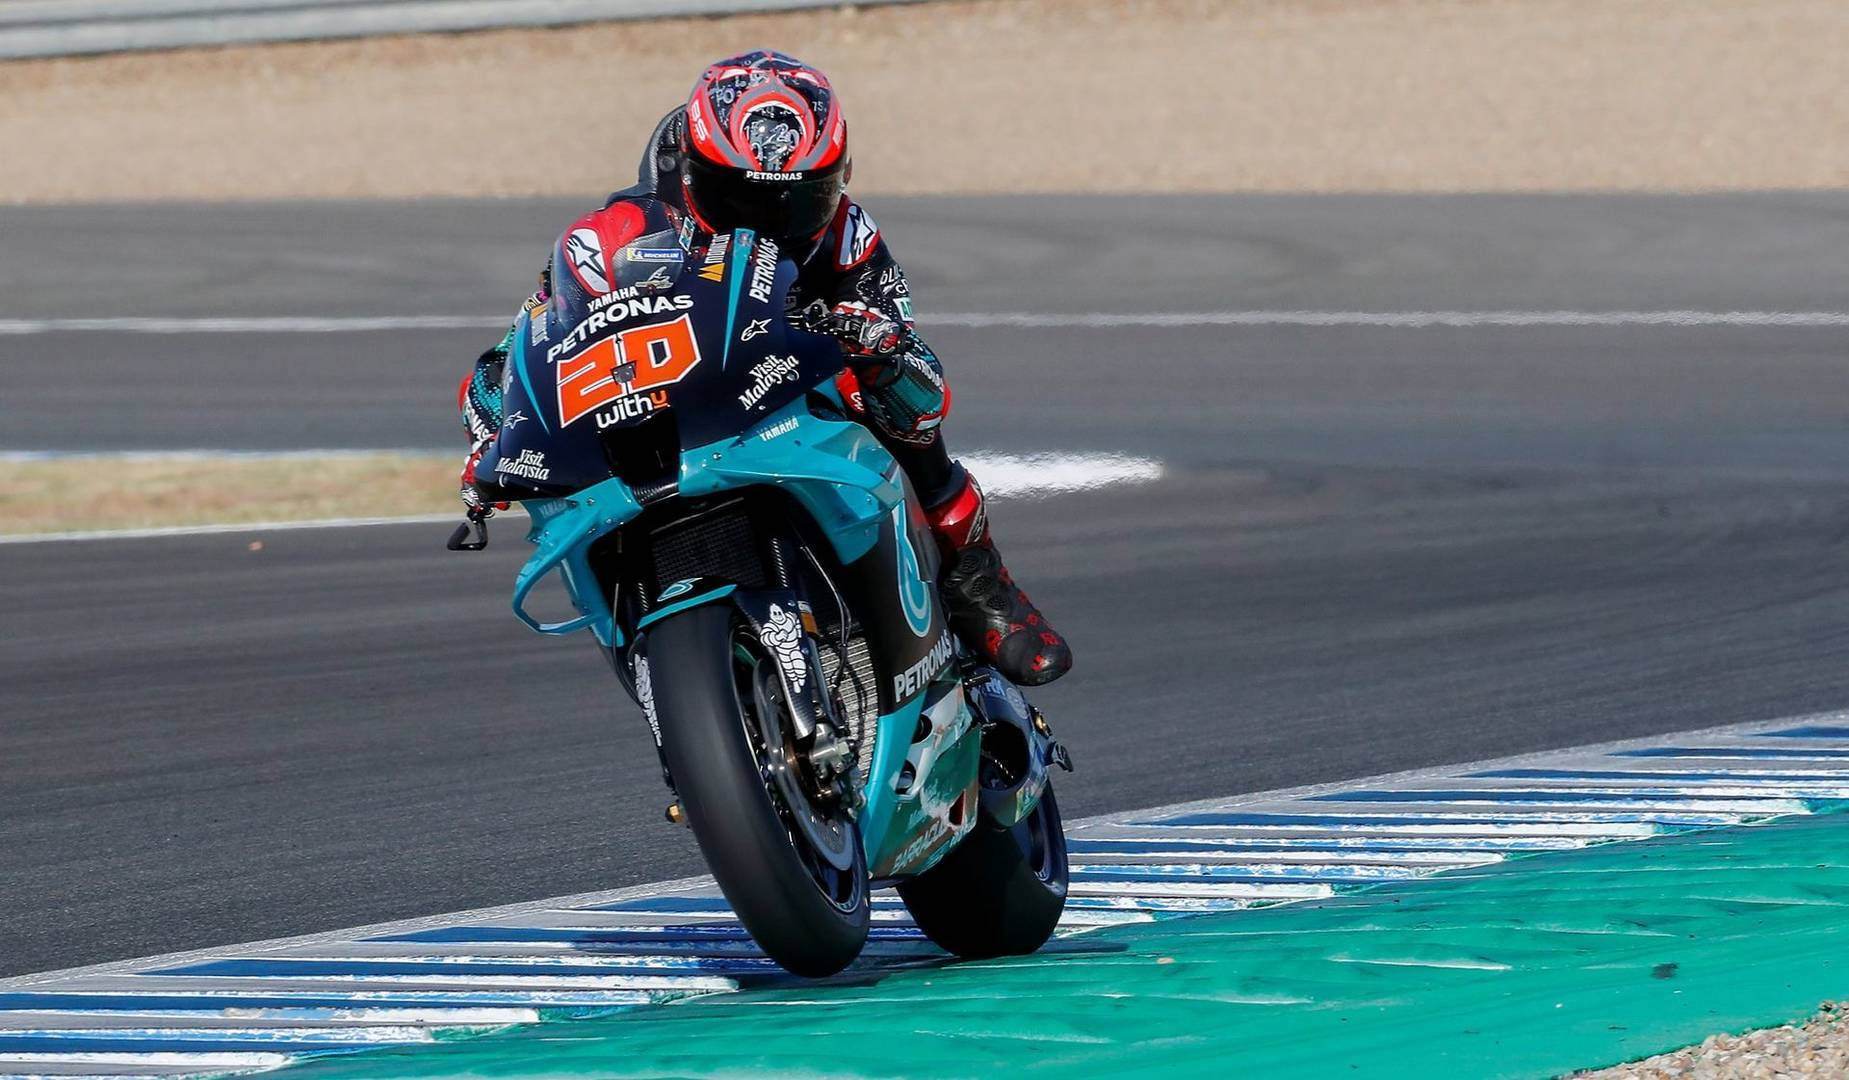 #SpanishGP   Fabio Quartararo se lleva su primera victoria en MotoGP